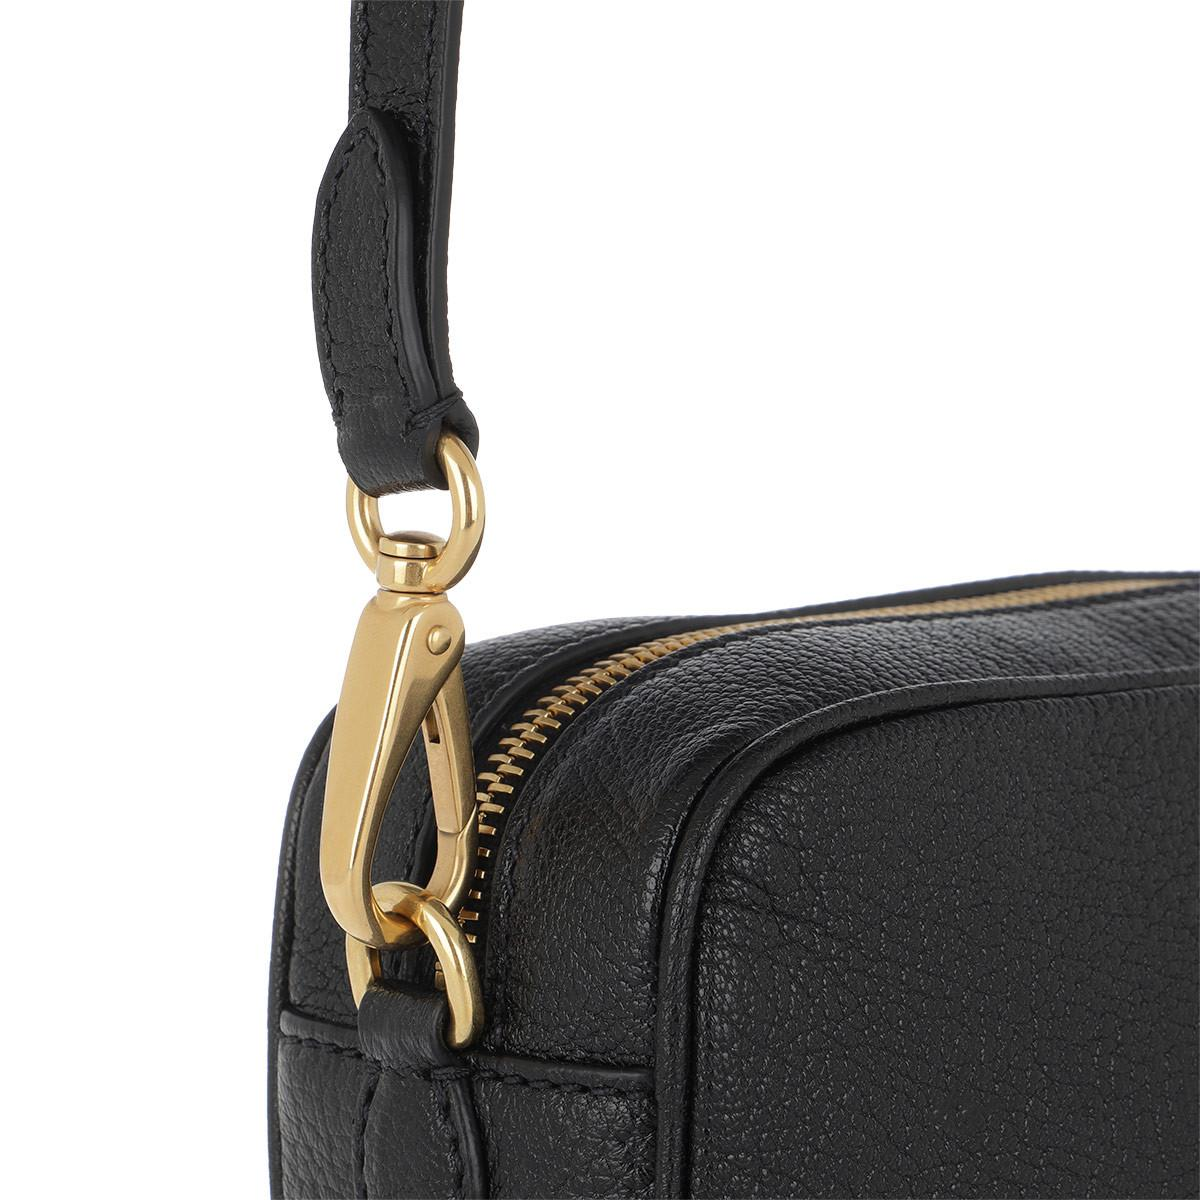 Miu Miu Madras Camera Bag Bow Nero in Black - Lyst 89c0b2a8aeaef